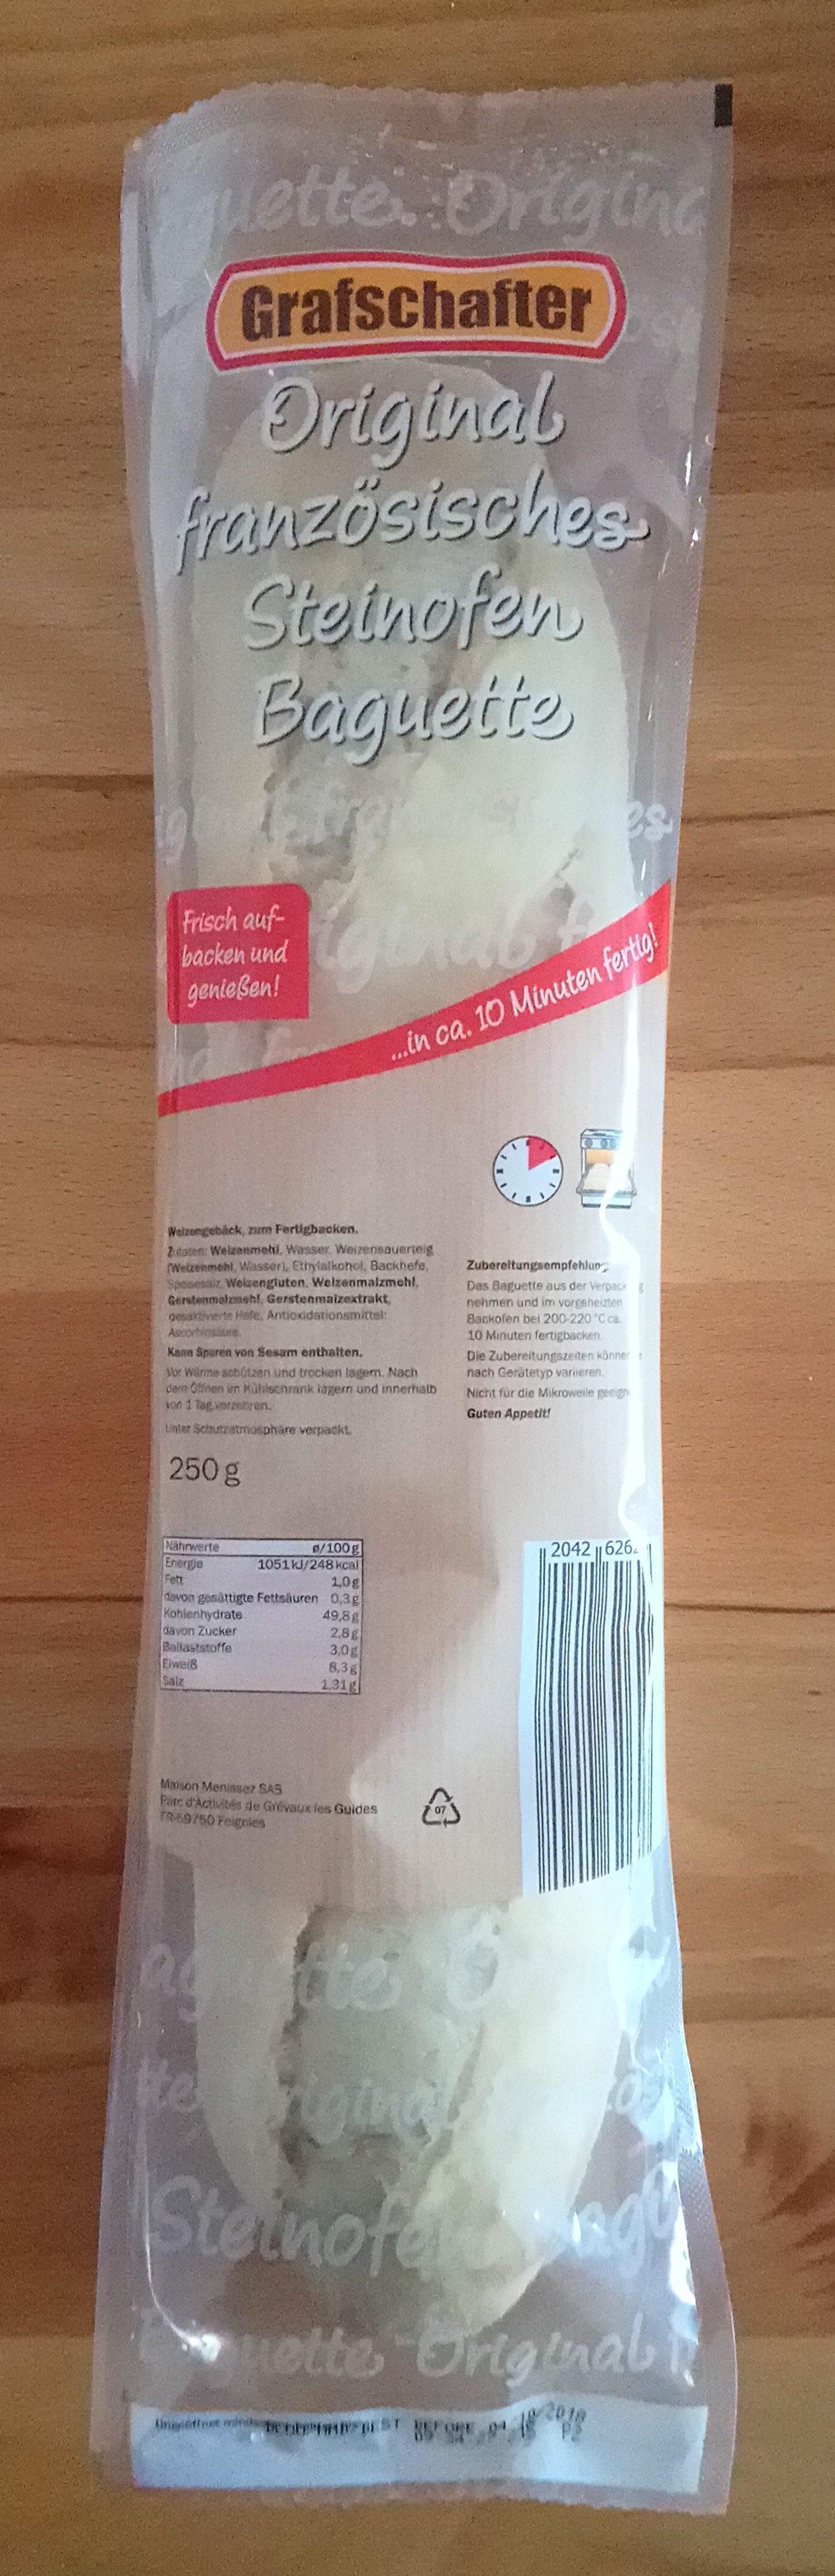 Original französisches Steinofen Baguette - Product - de